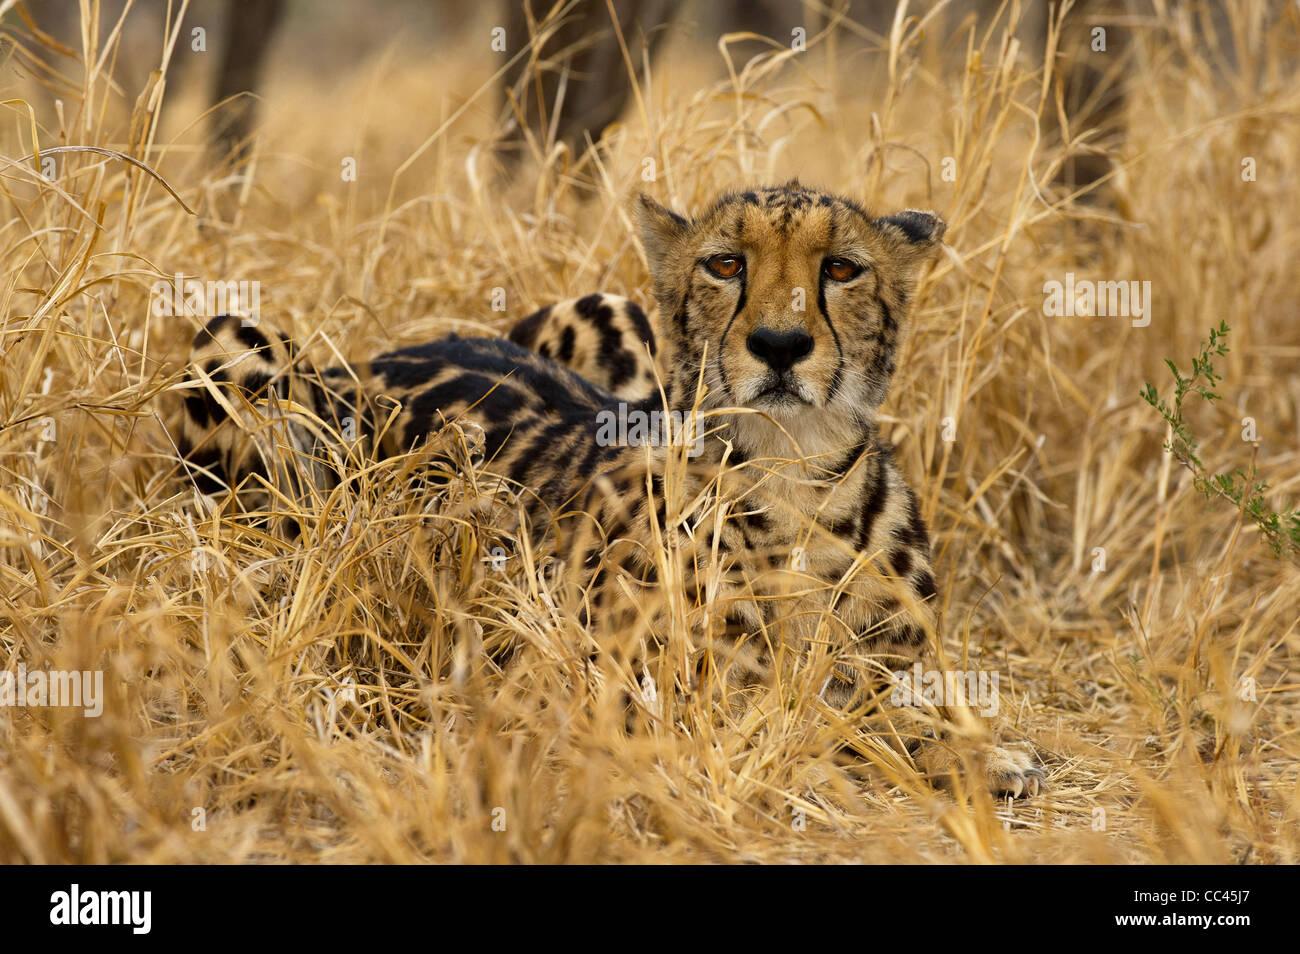 A King Cheetah resting - Stock Image